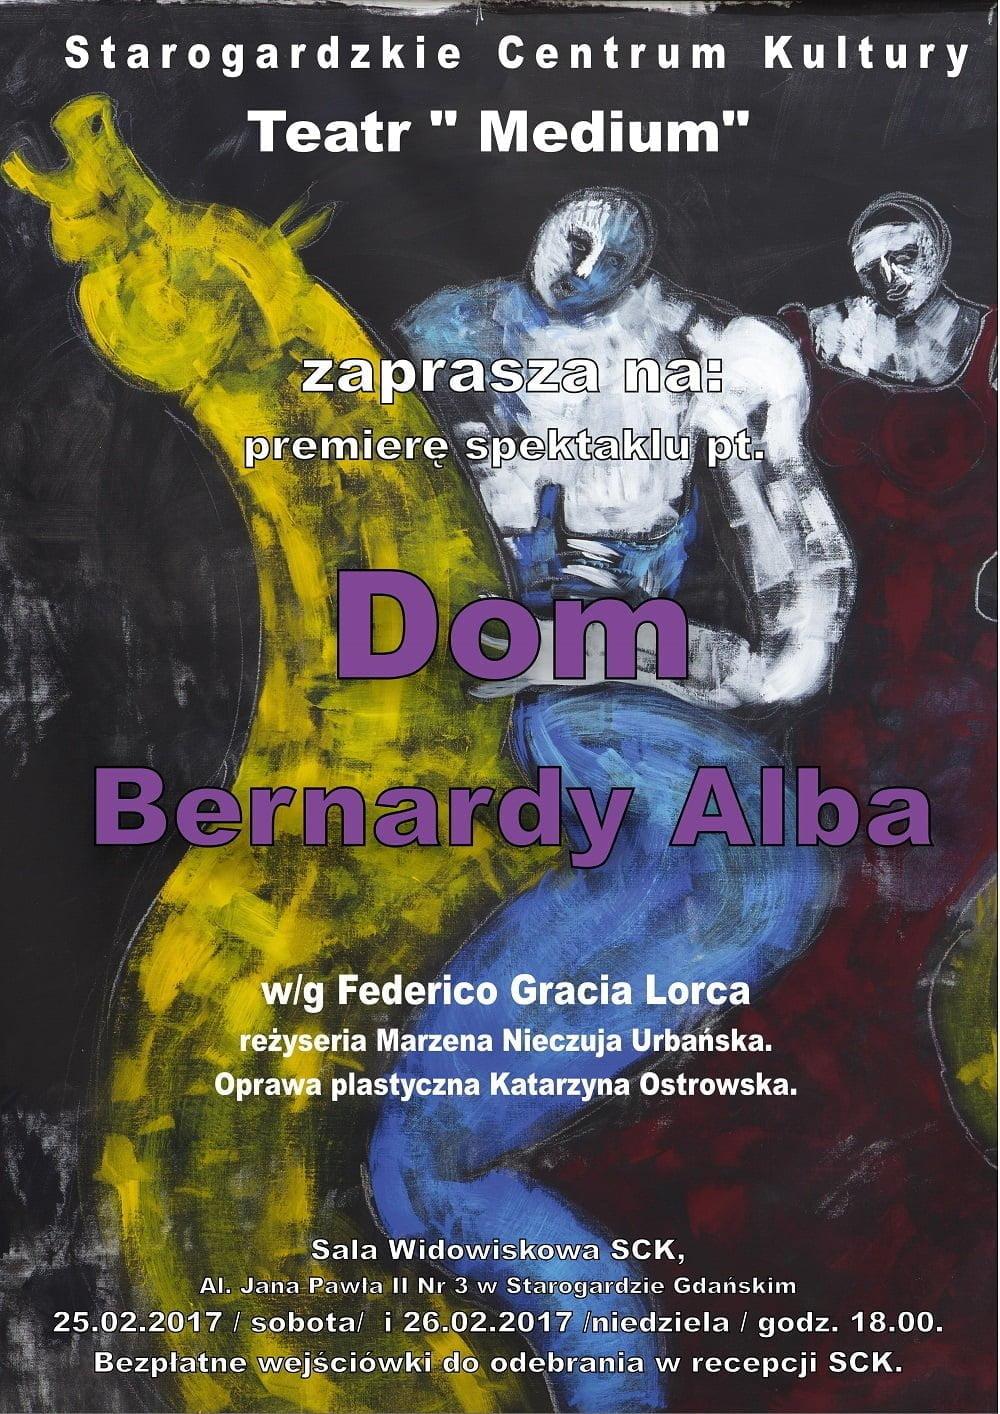 Premiera spektaklu Teatru Medium - Dom Bernardy Alba